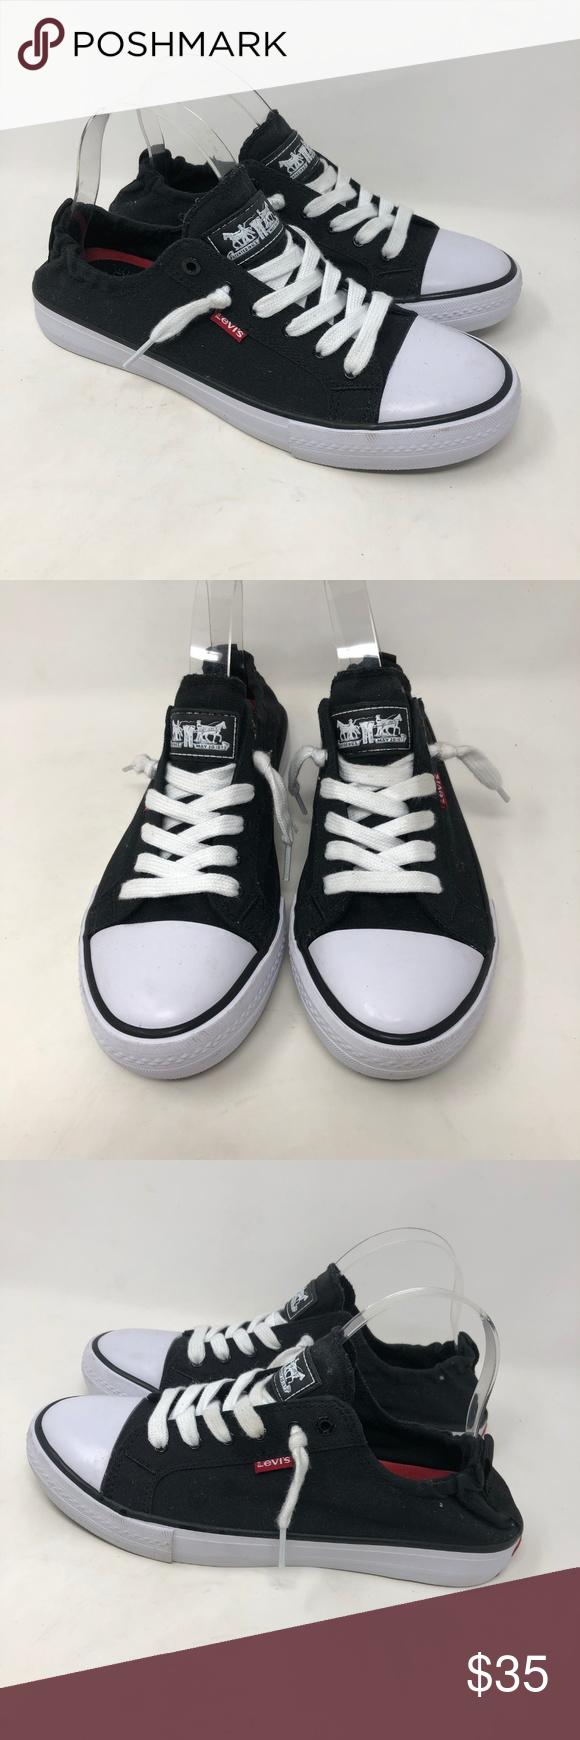 4baf55ee Levi's Stan G Comfort Tech Black Sneakers 9 -Levi's black canvas women's  comfort tech sneakers -Size 9 -Elastic in back ankle -Excellent condition  Levi's ...